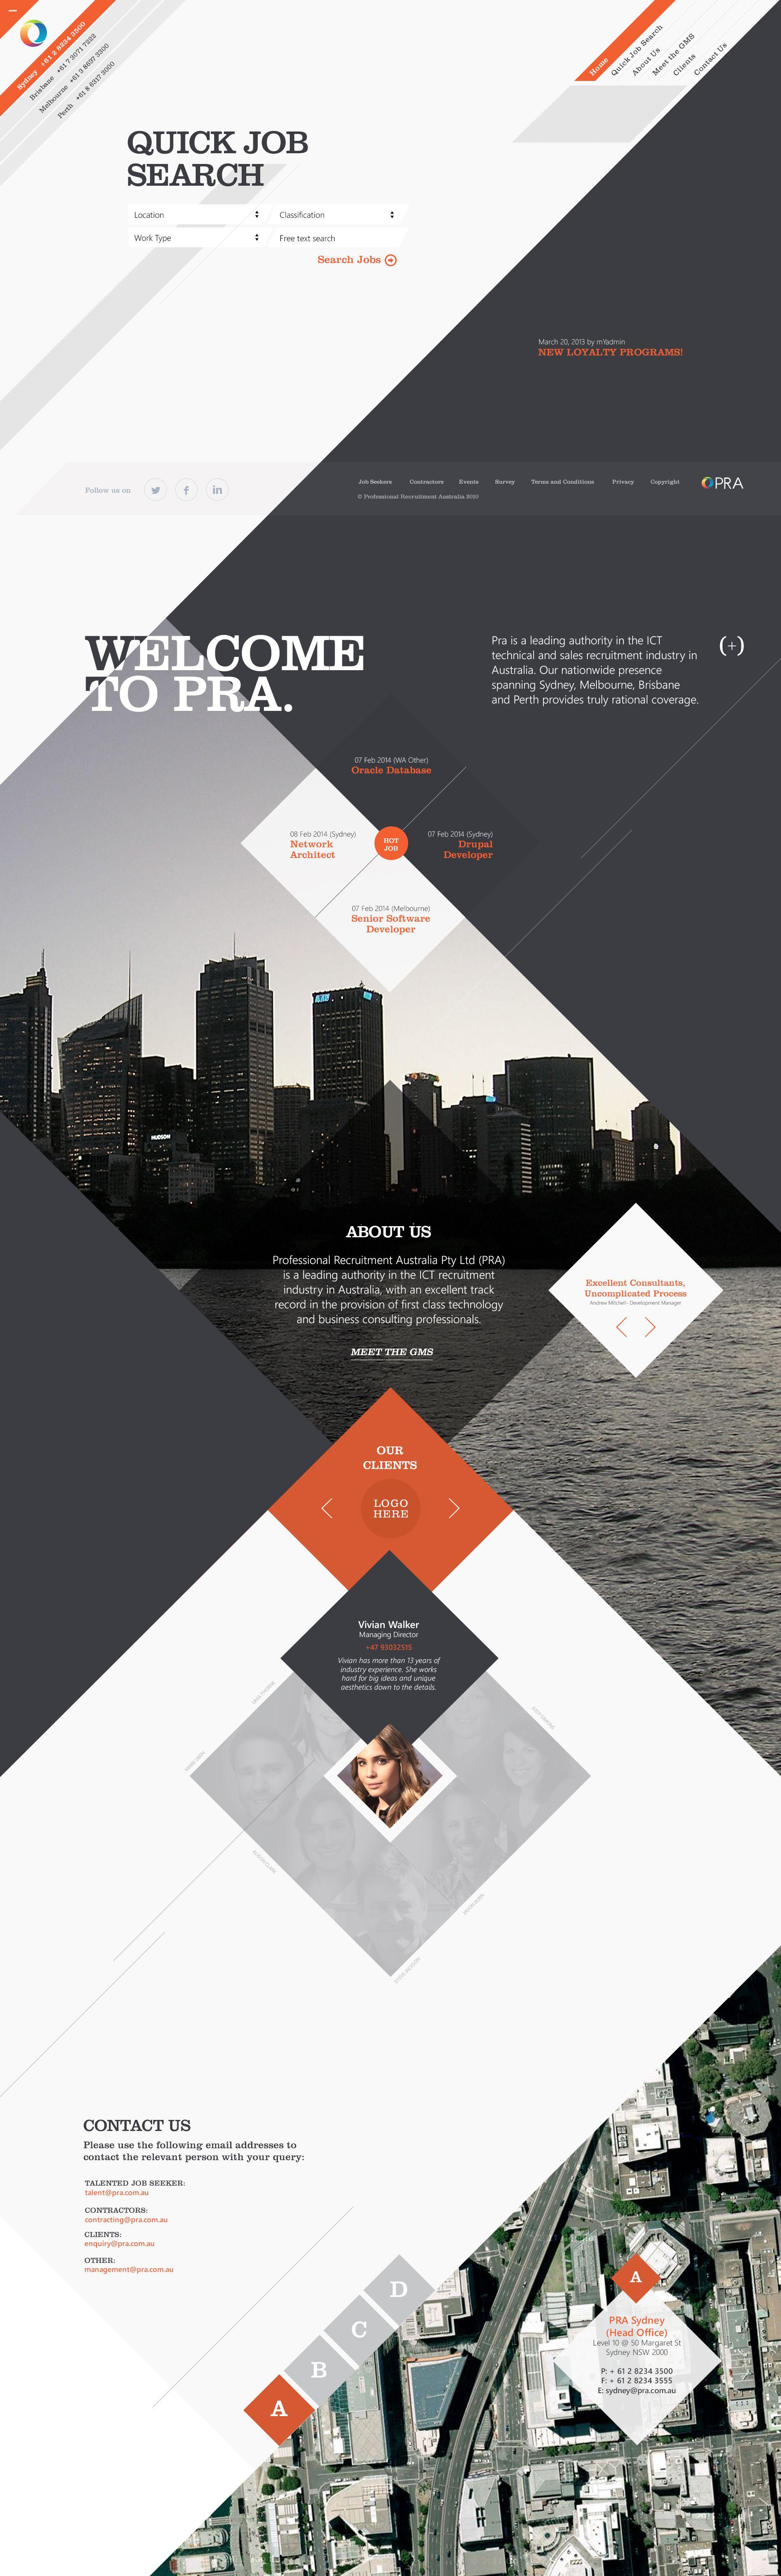 Cool Web Design On The Internet Pra Webdesign It Web Design Layout Userinterface Website Webdesign Fun Website Design Web Layout Design Web Design